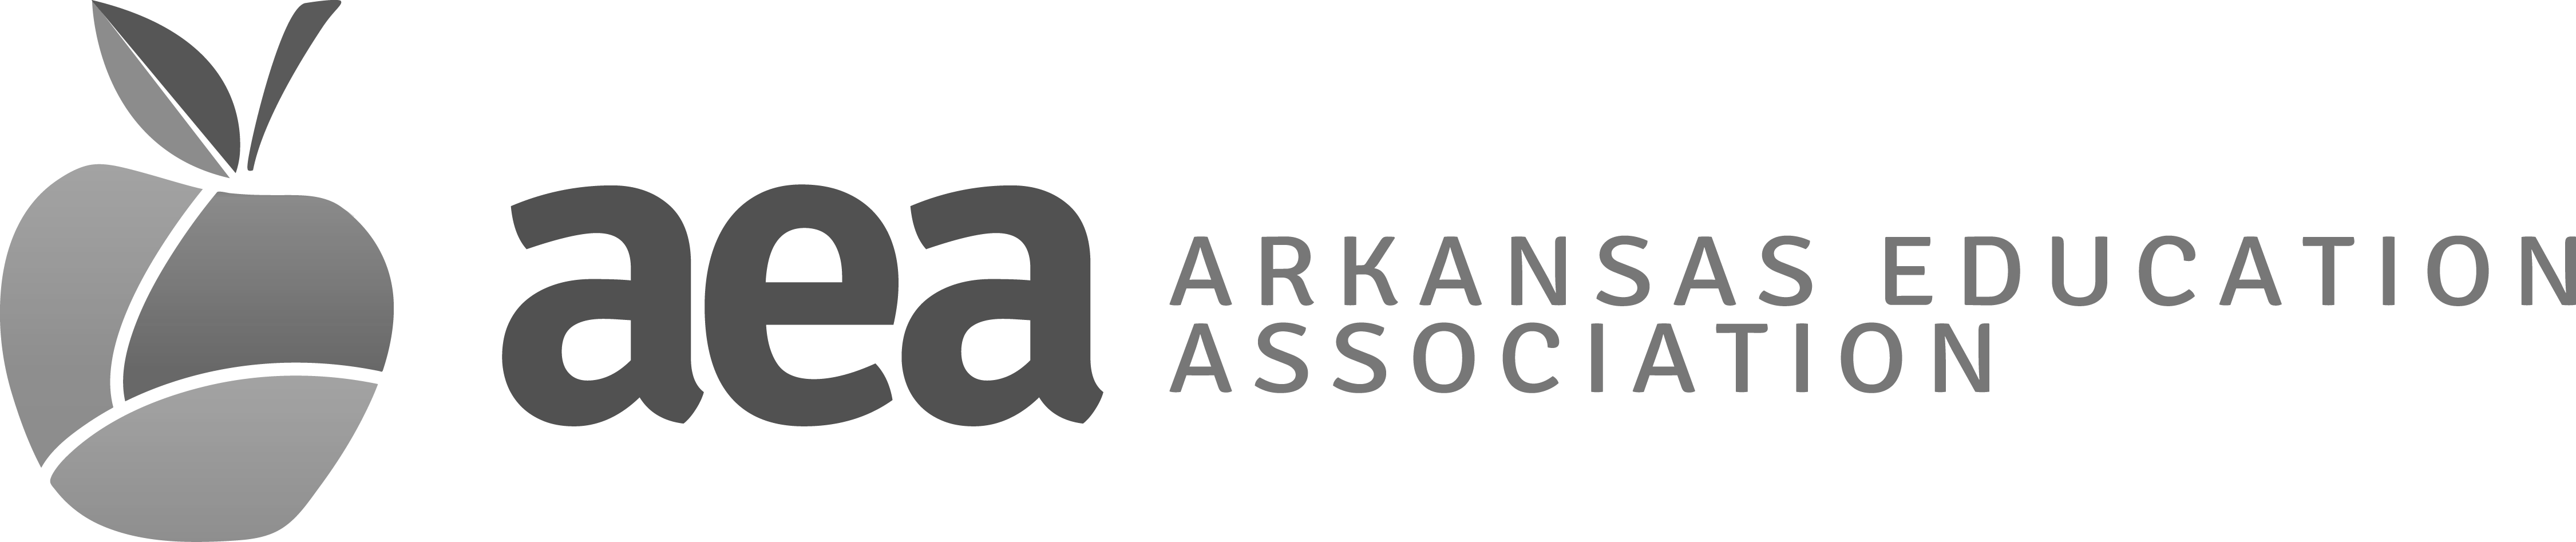 arkansas education association mobile app